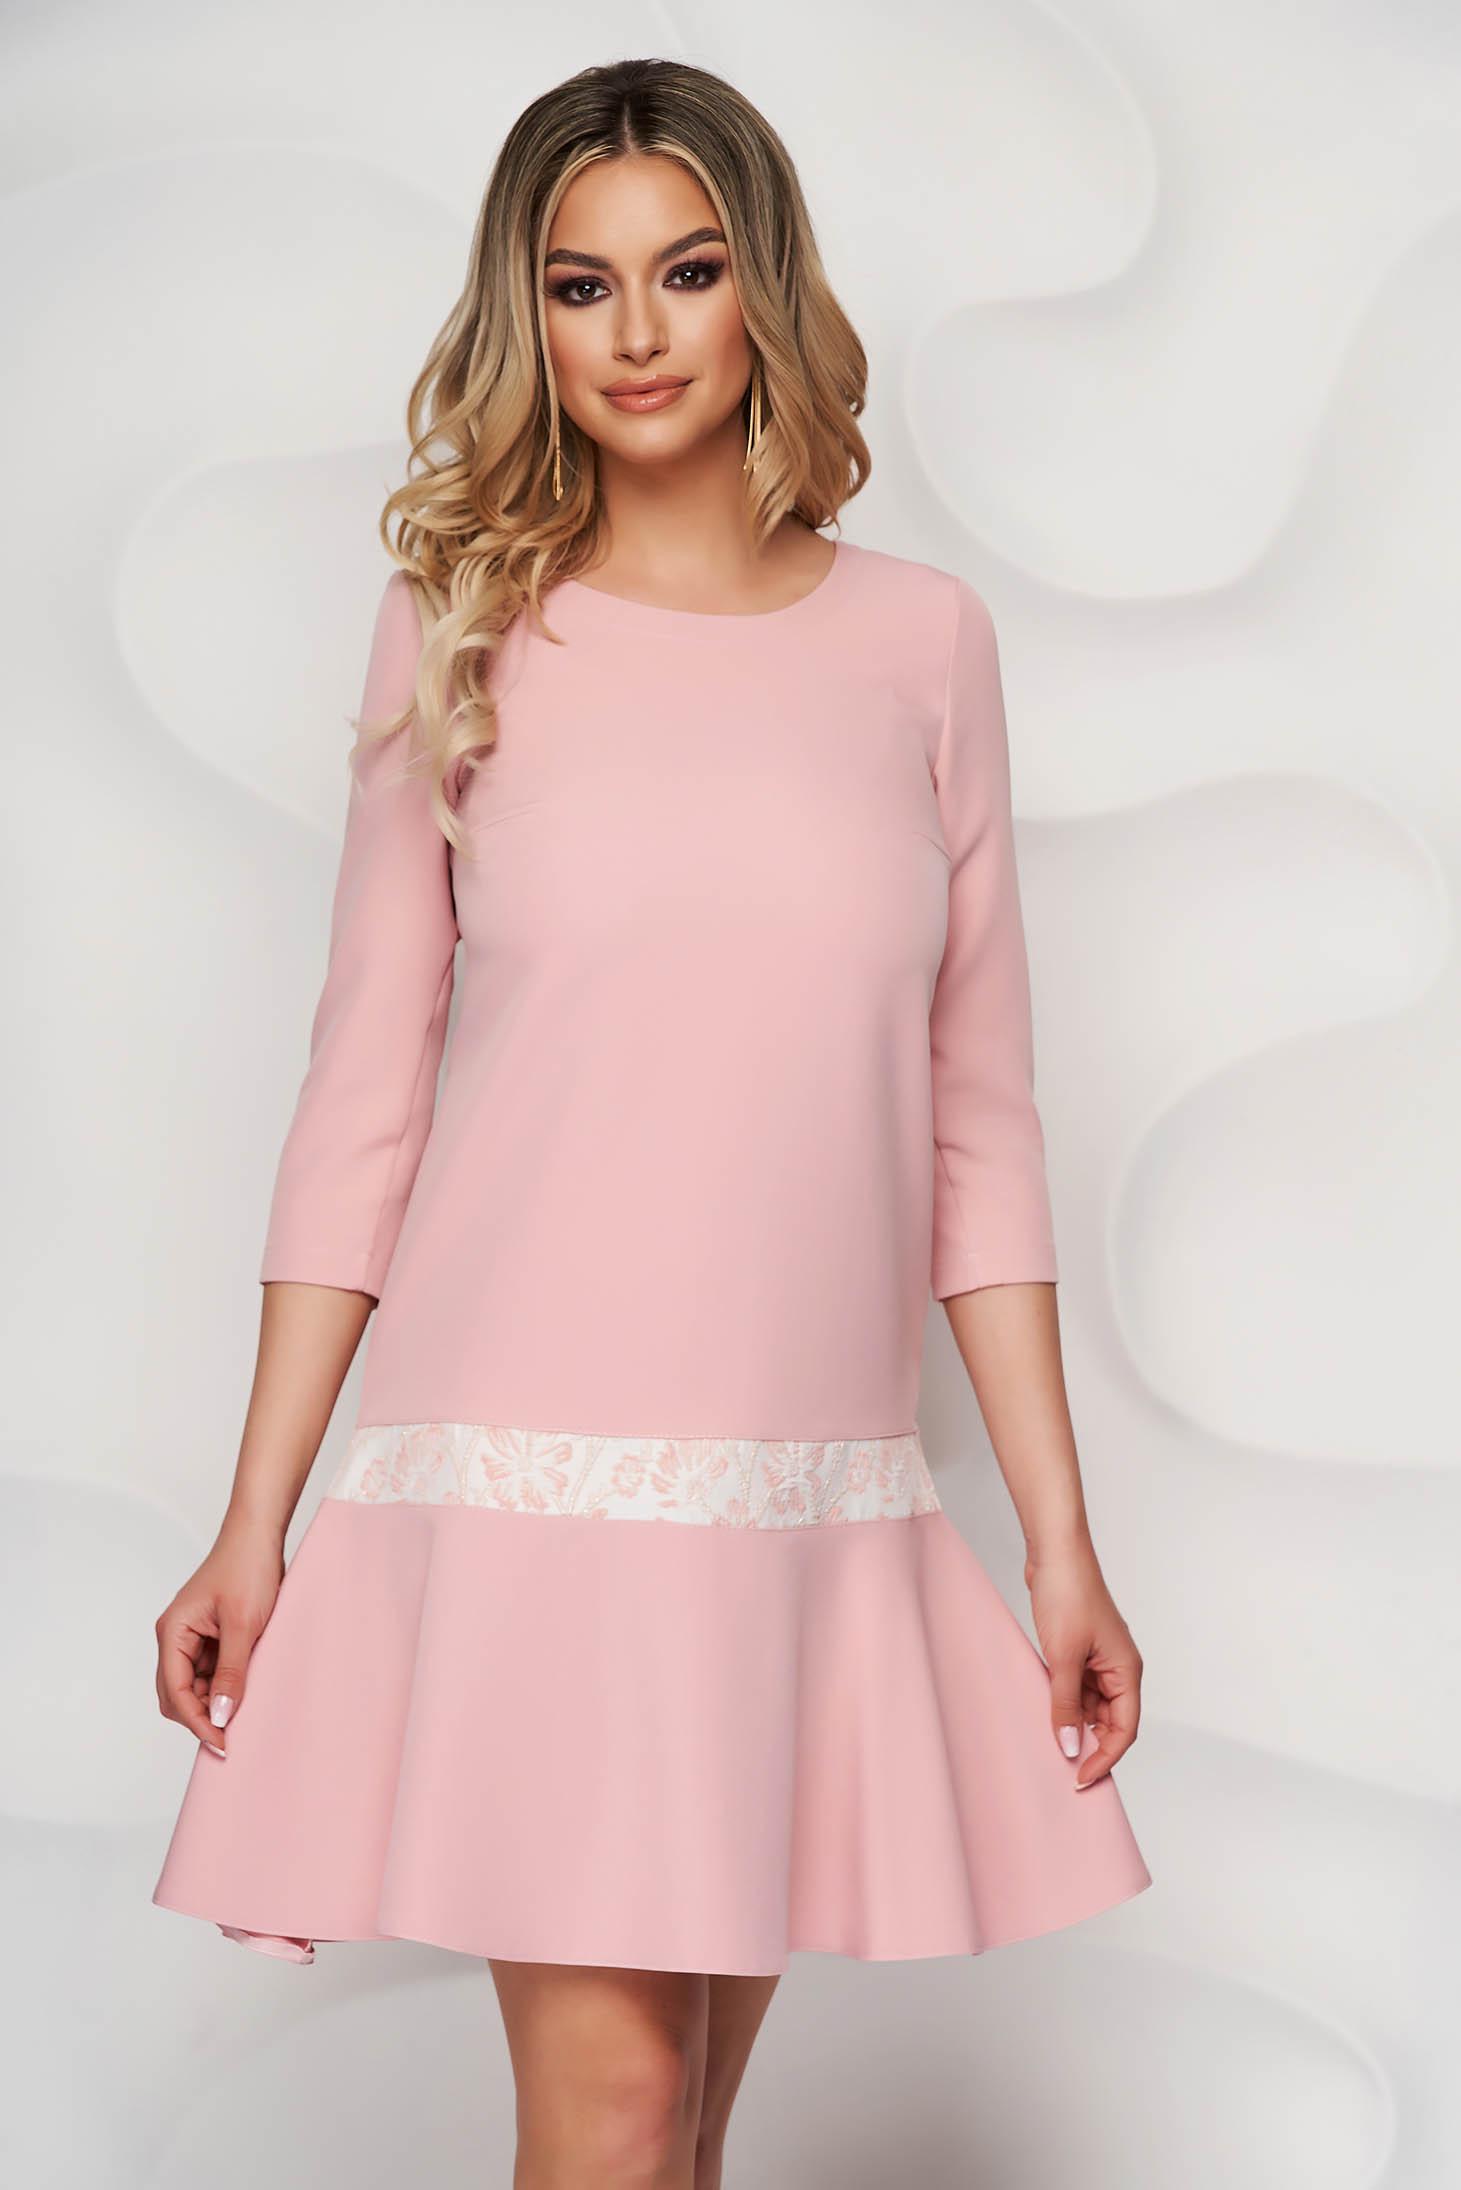 StarShinerS lightpink dress elegant short cut loose fit